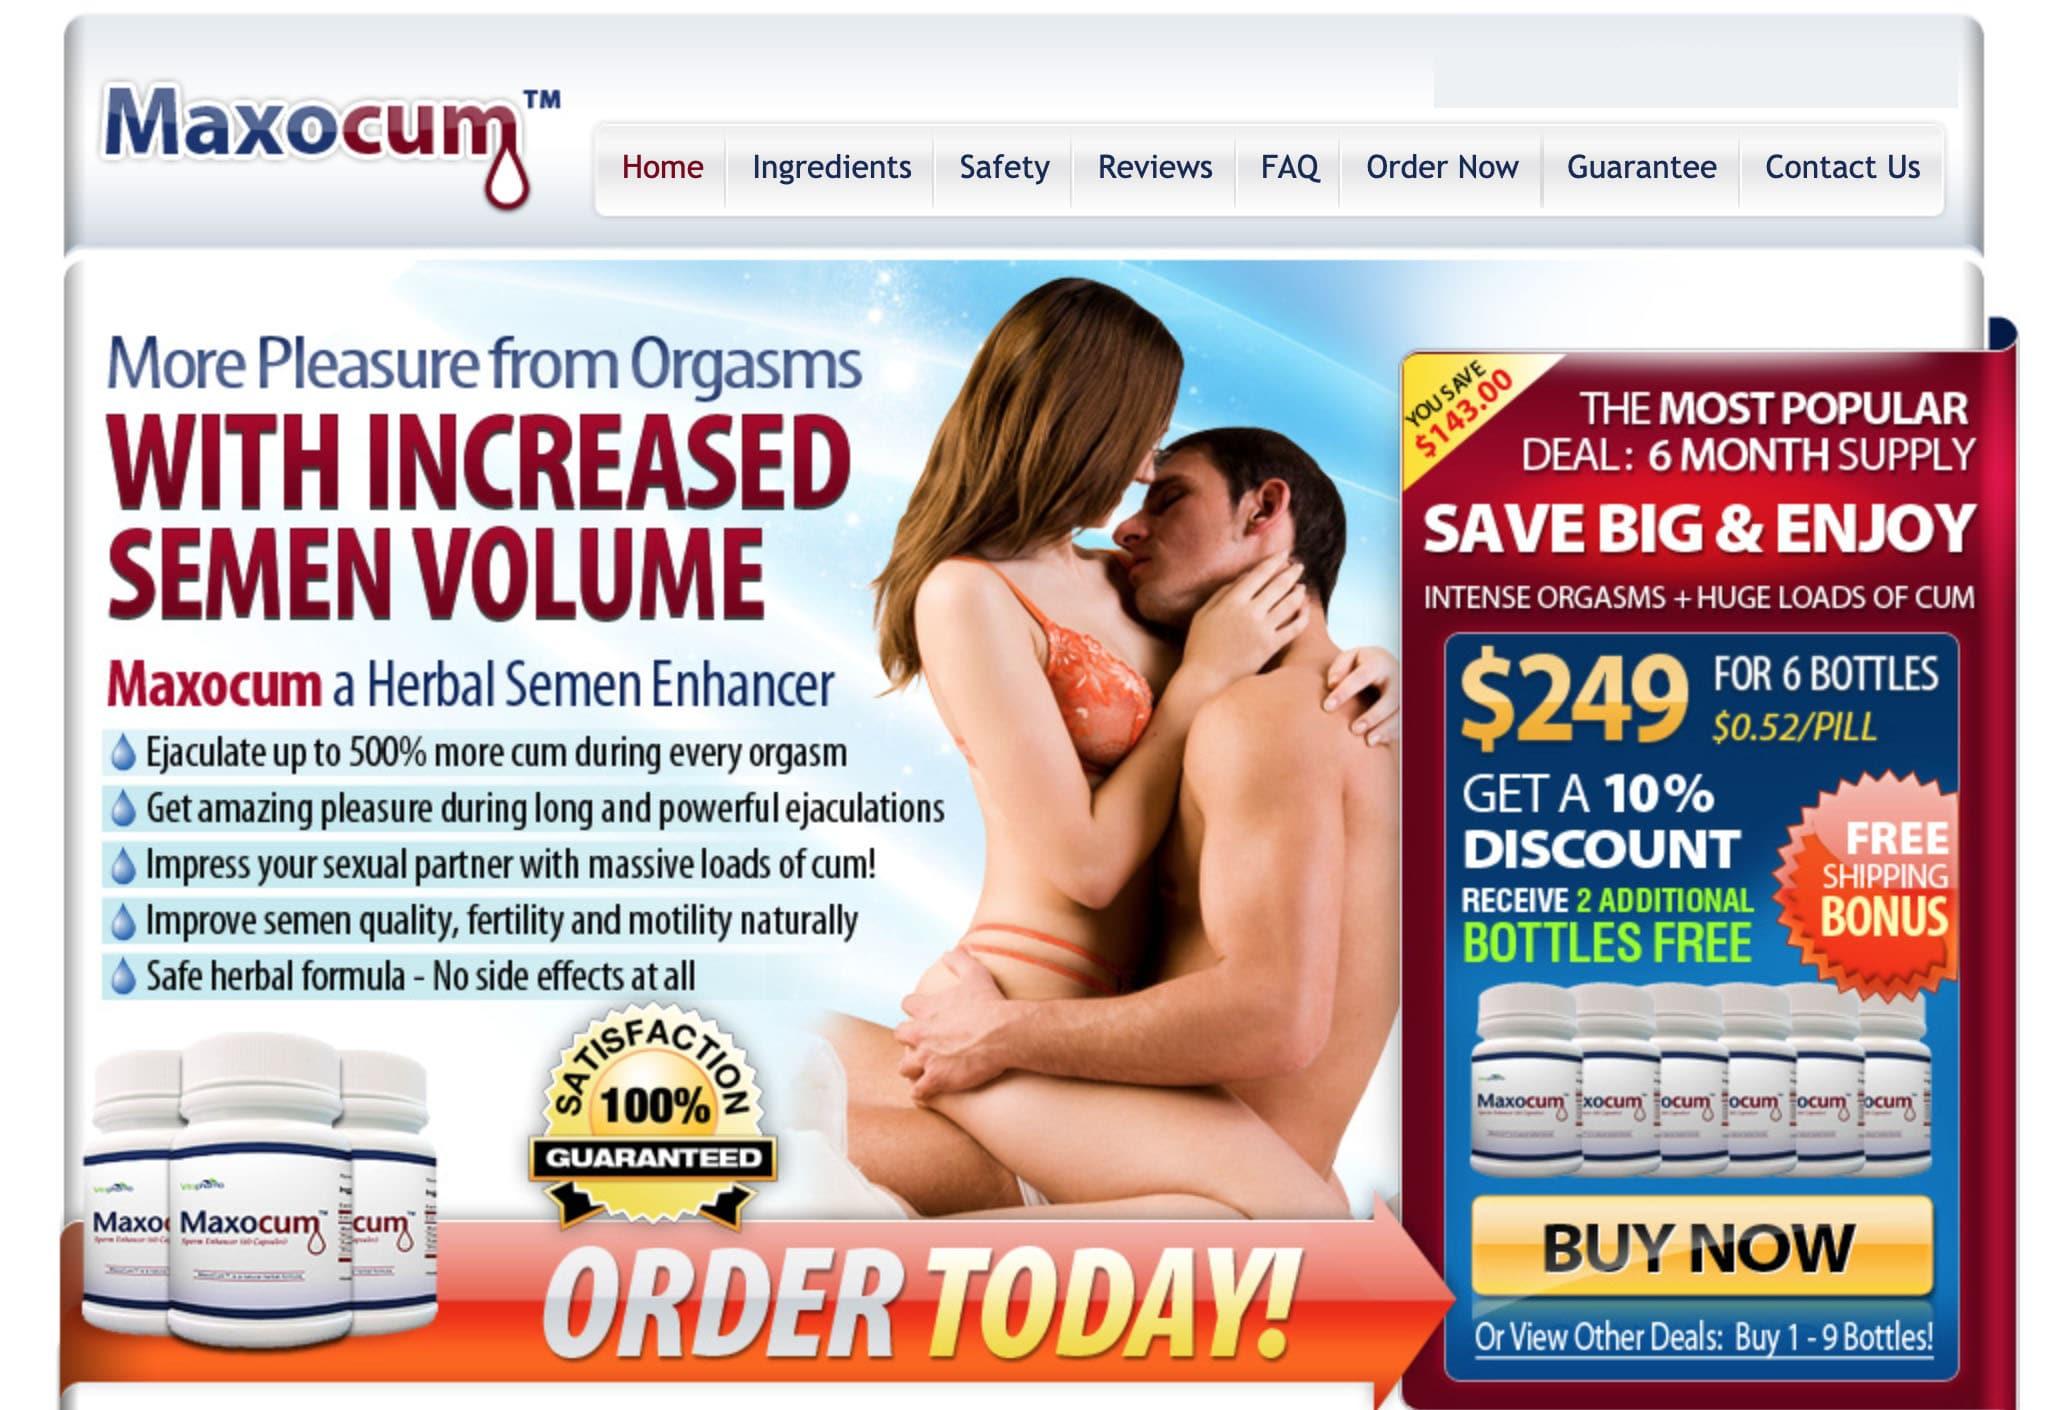 maxocum uk website